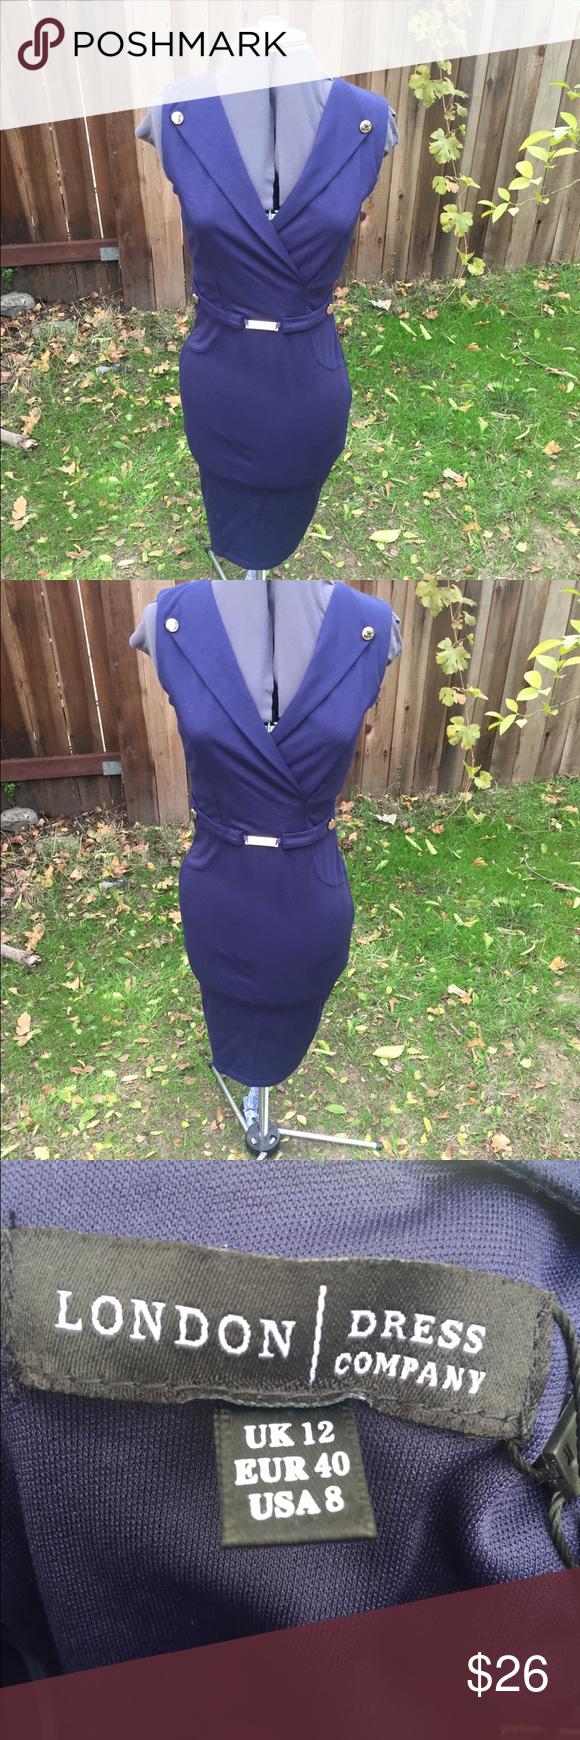 Women navy blue dress nwt women london dress company size